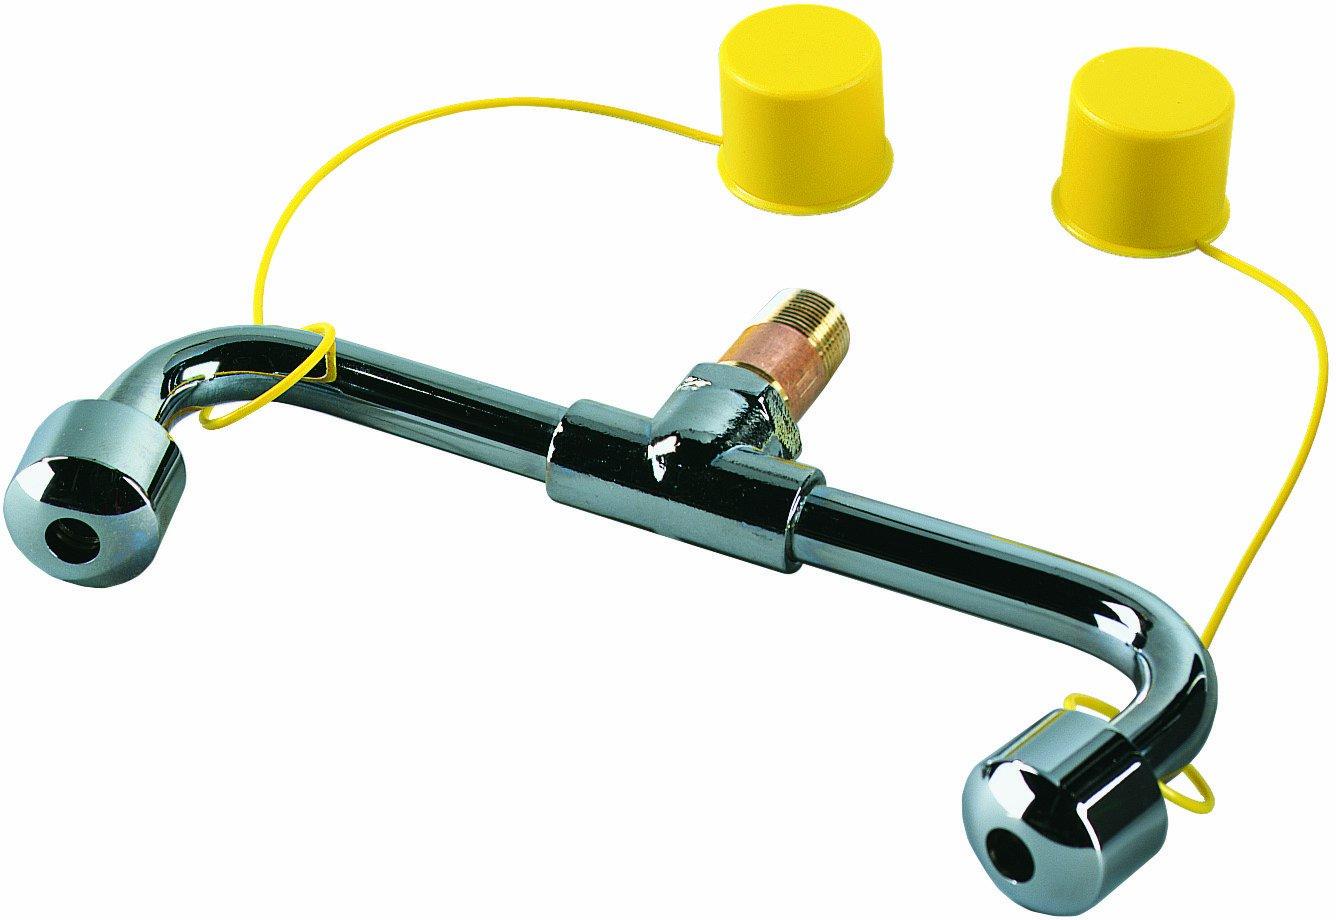 Bradley S39-394 Eyewash Spray Head Assembly with Supply Stem